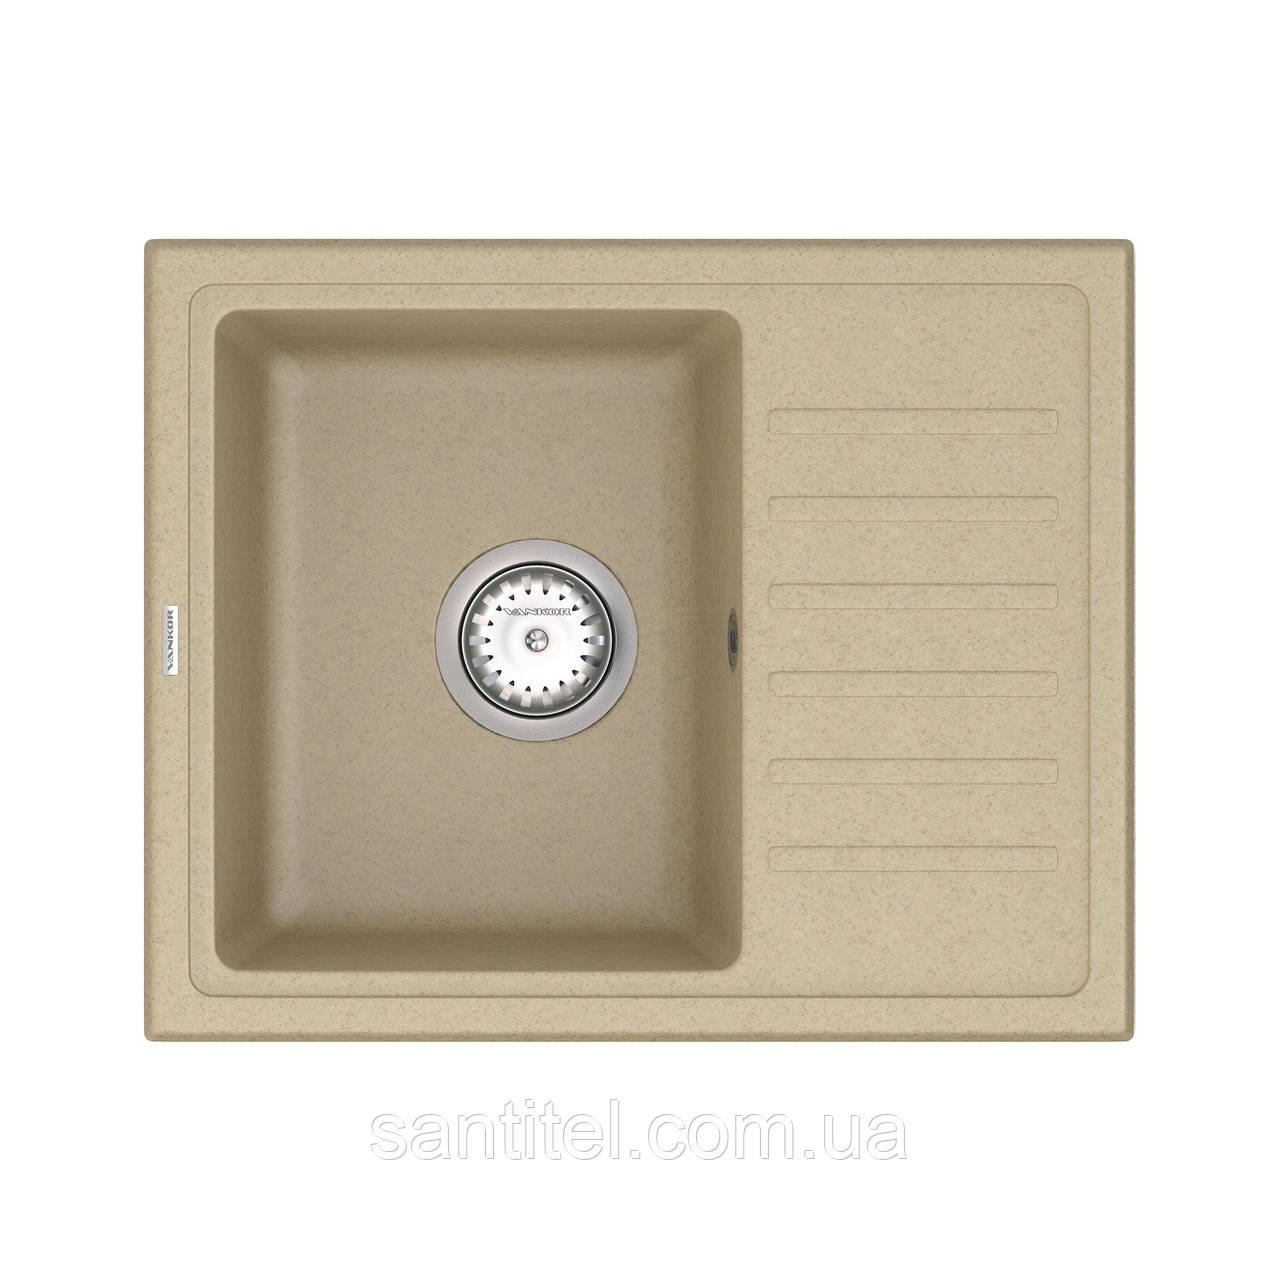 Кухонная мойка VANKOR Lira LMP 02.55 Safari + сифон VANKOR